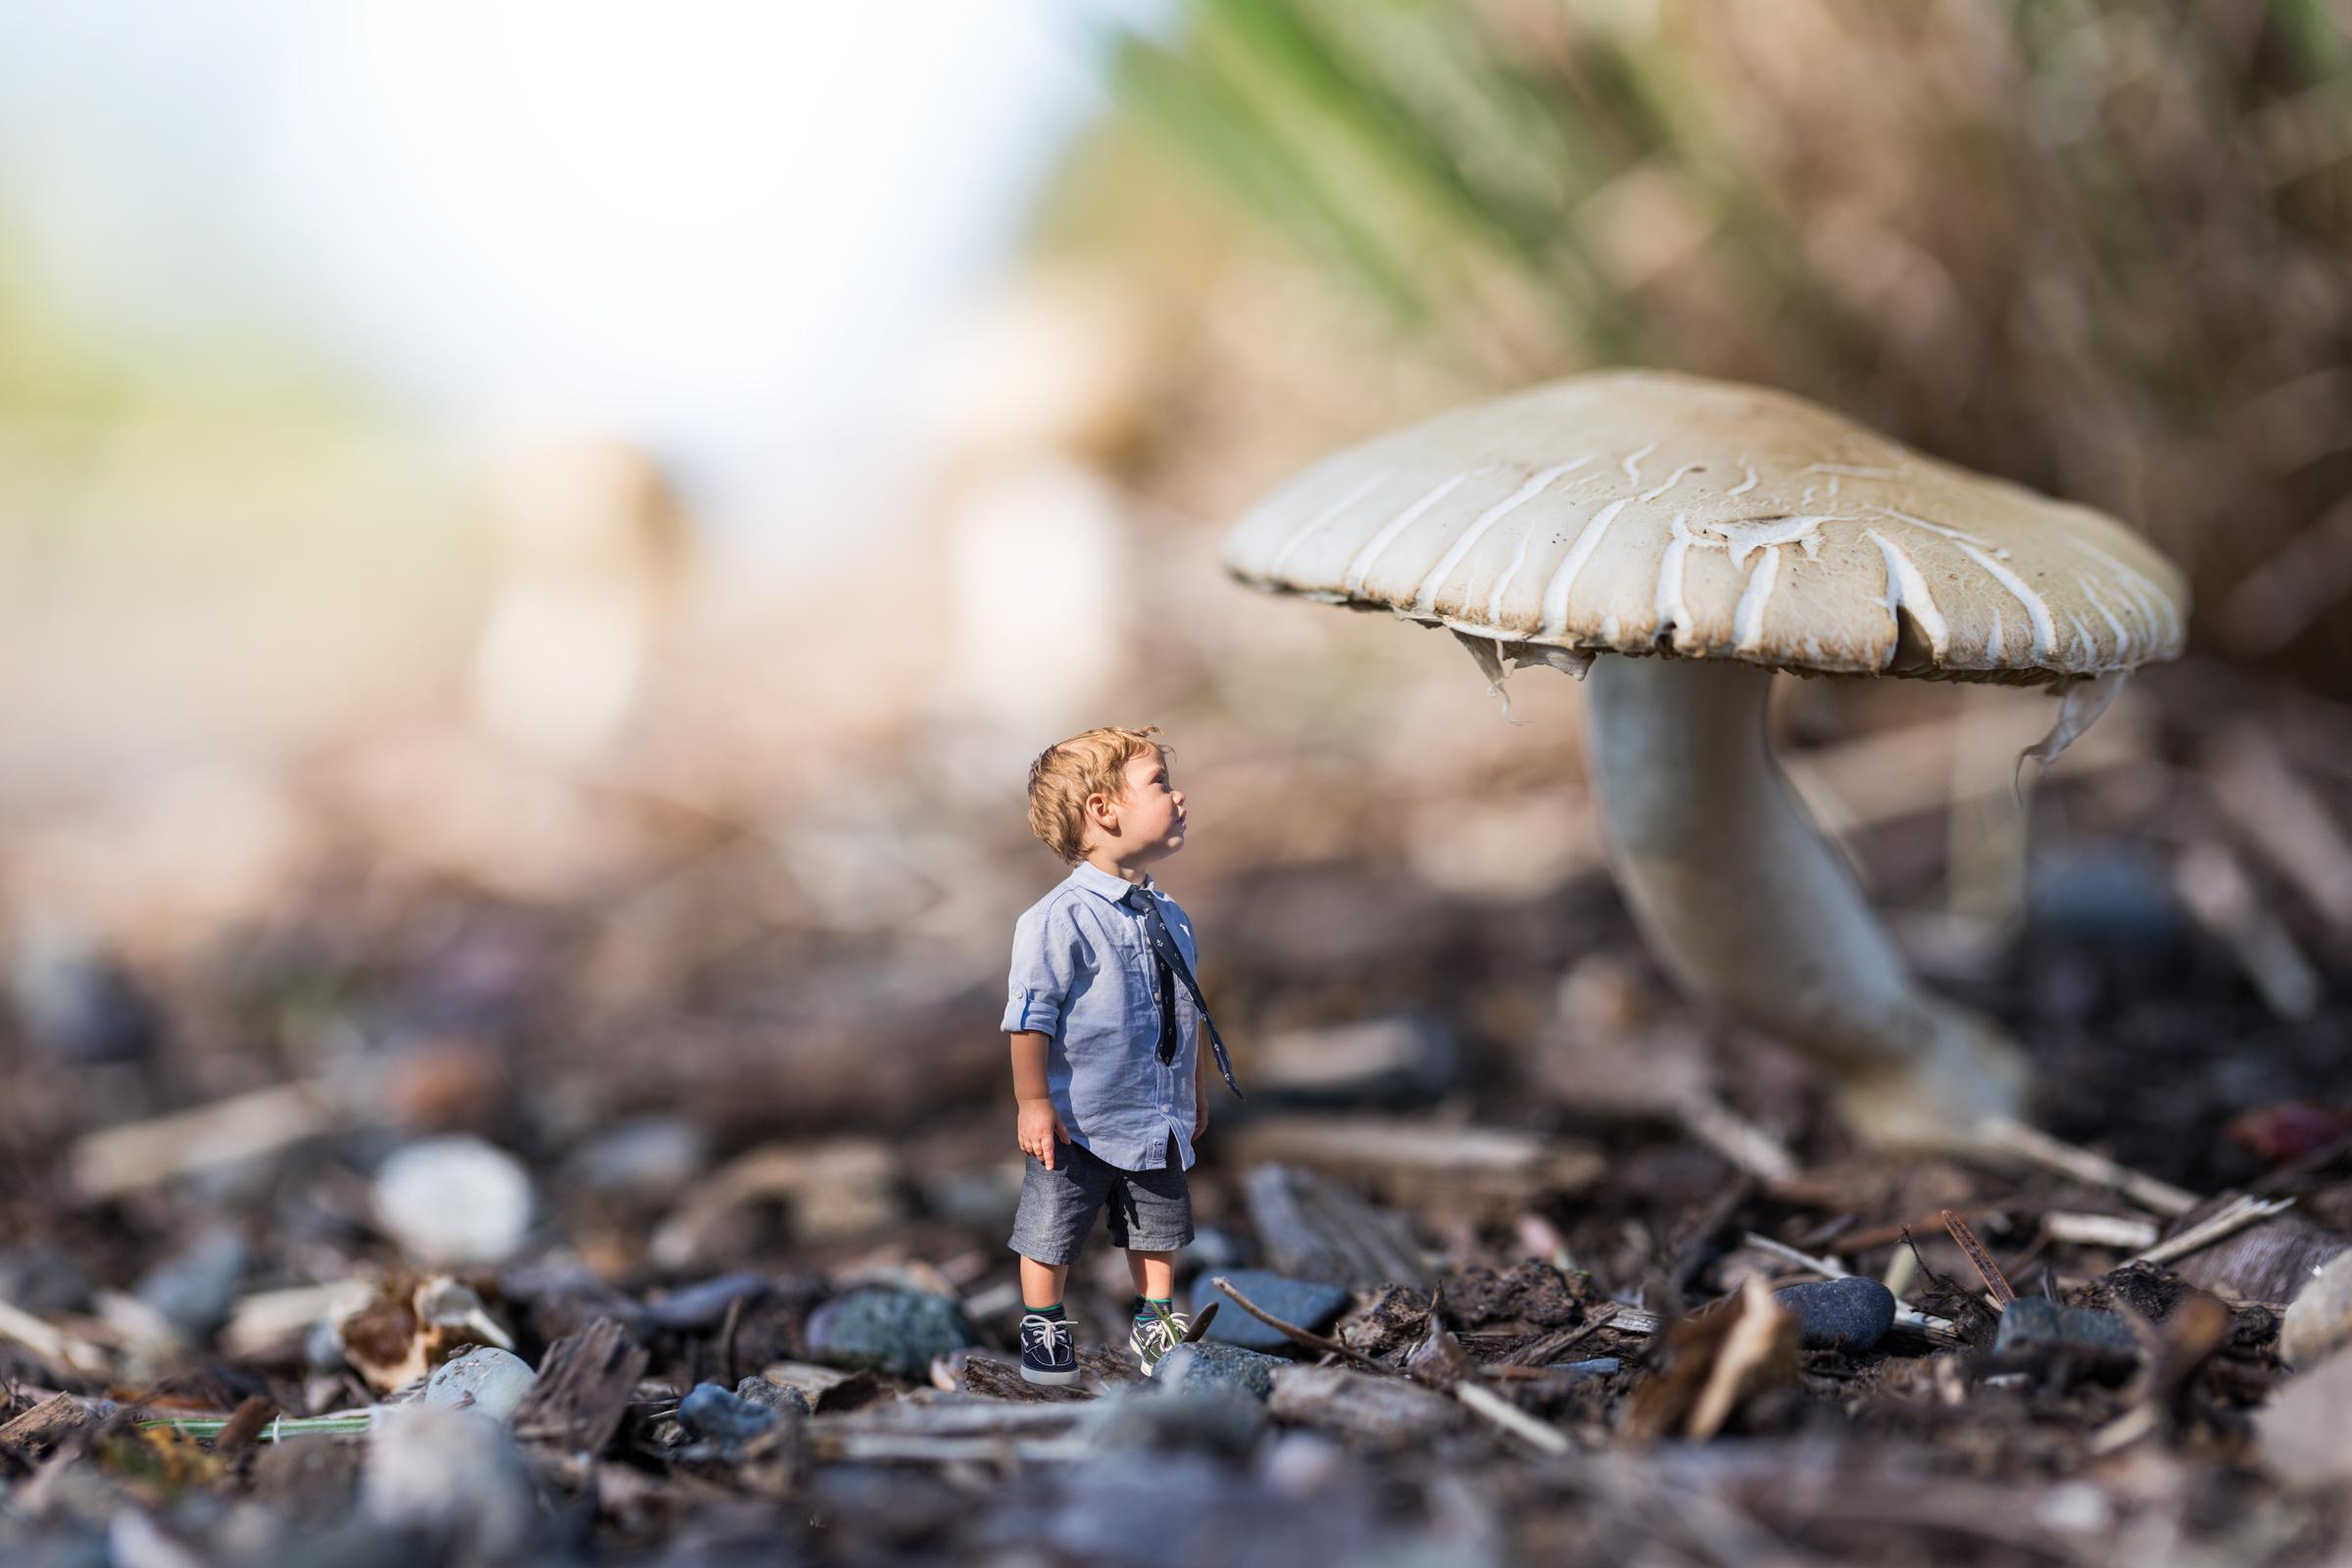 Healdsburg_Mushroom.jpg